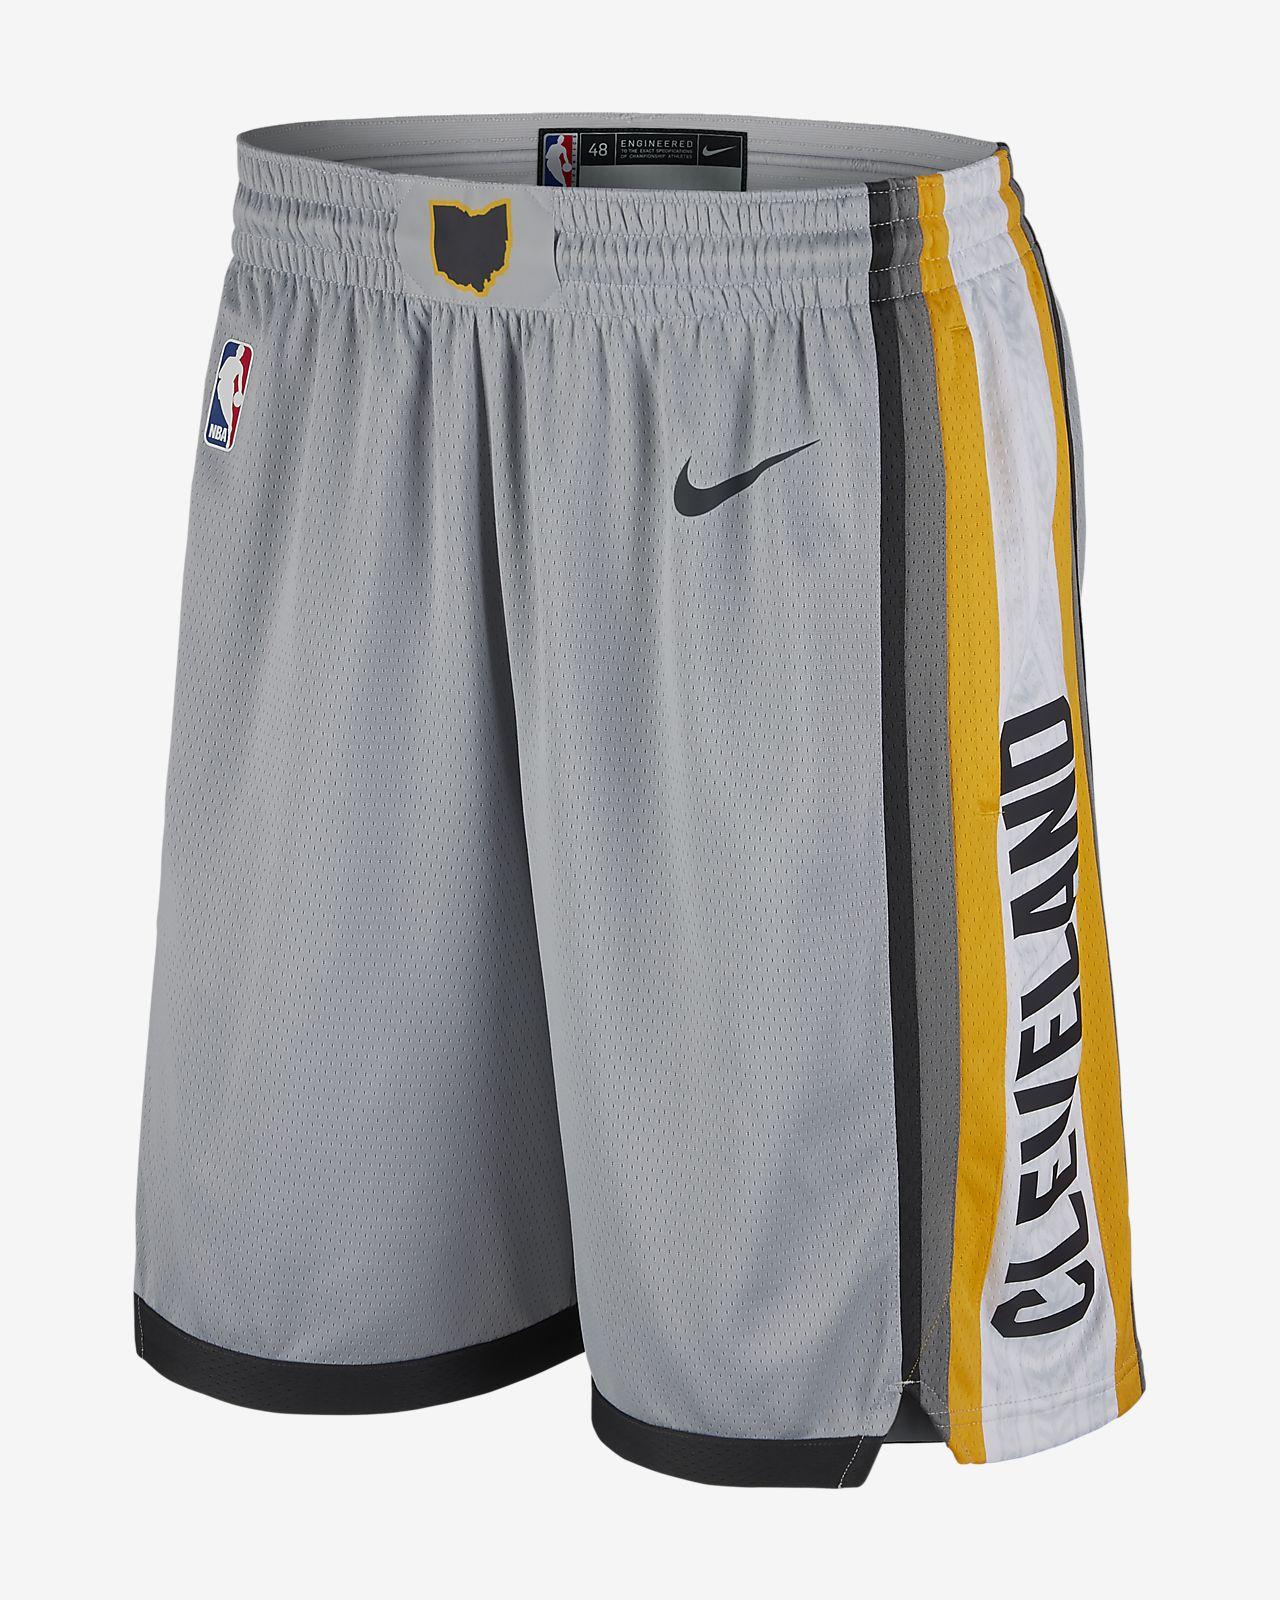 d71859ac158 Cleveland Cavaliers Nike City Edition Swingman Men s NBA Shorts ...